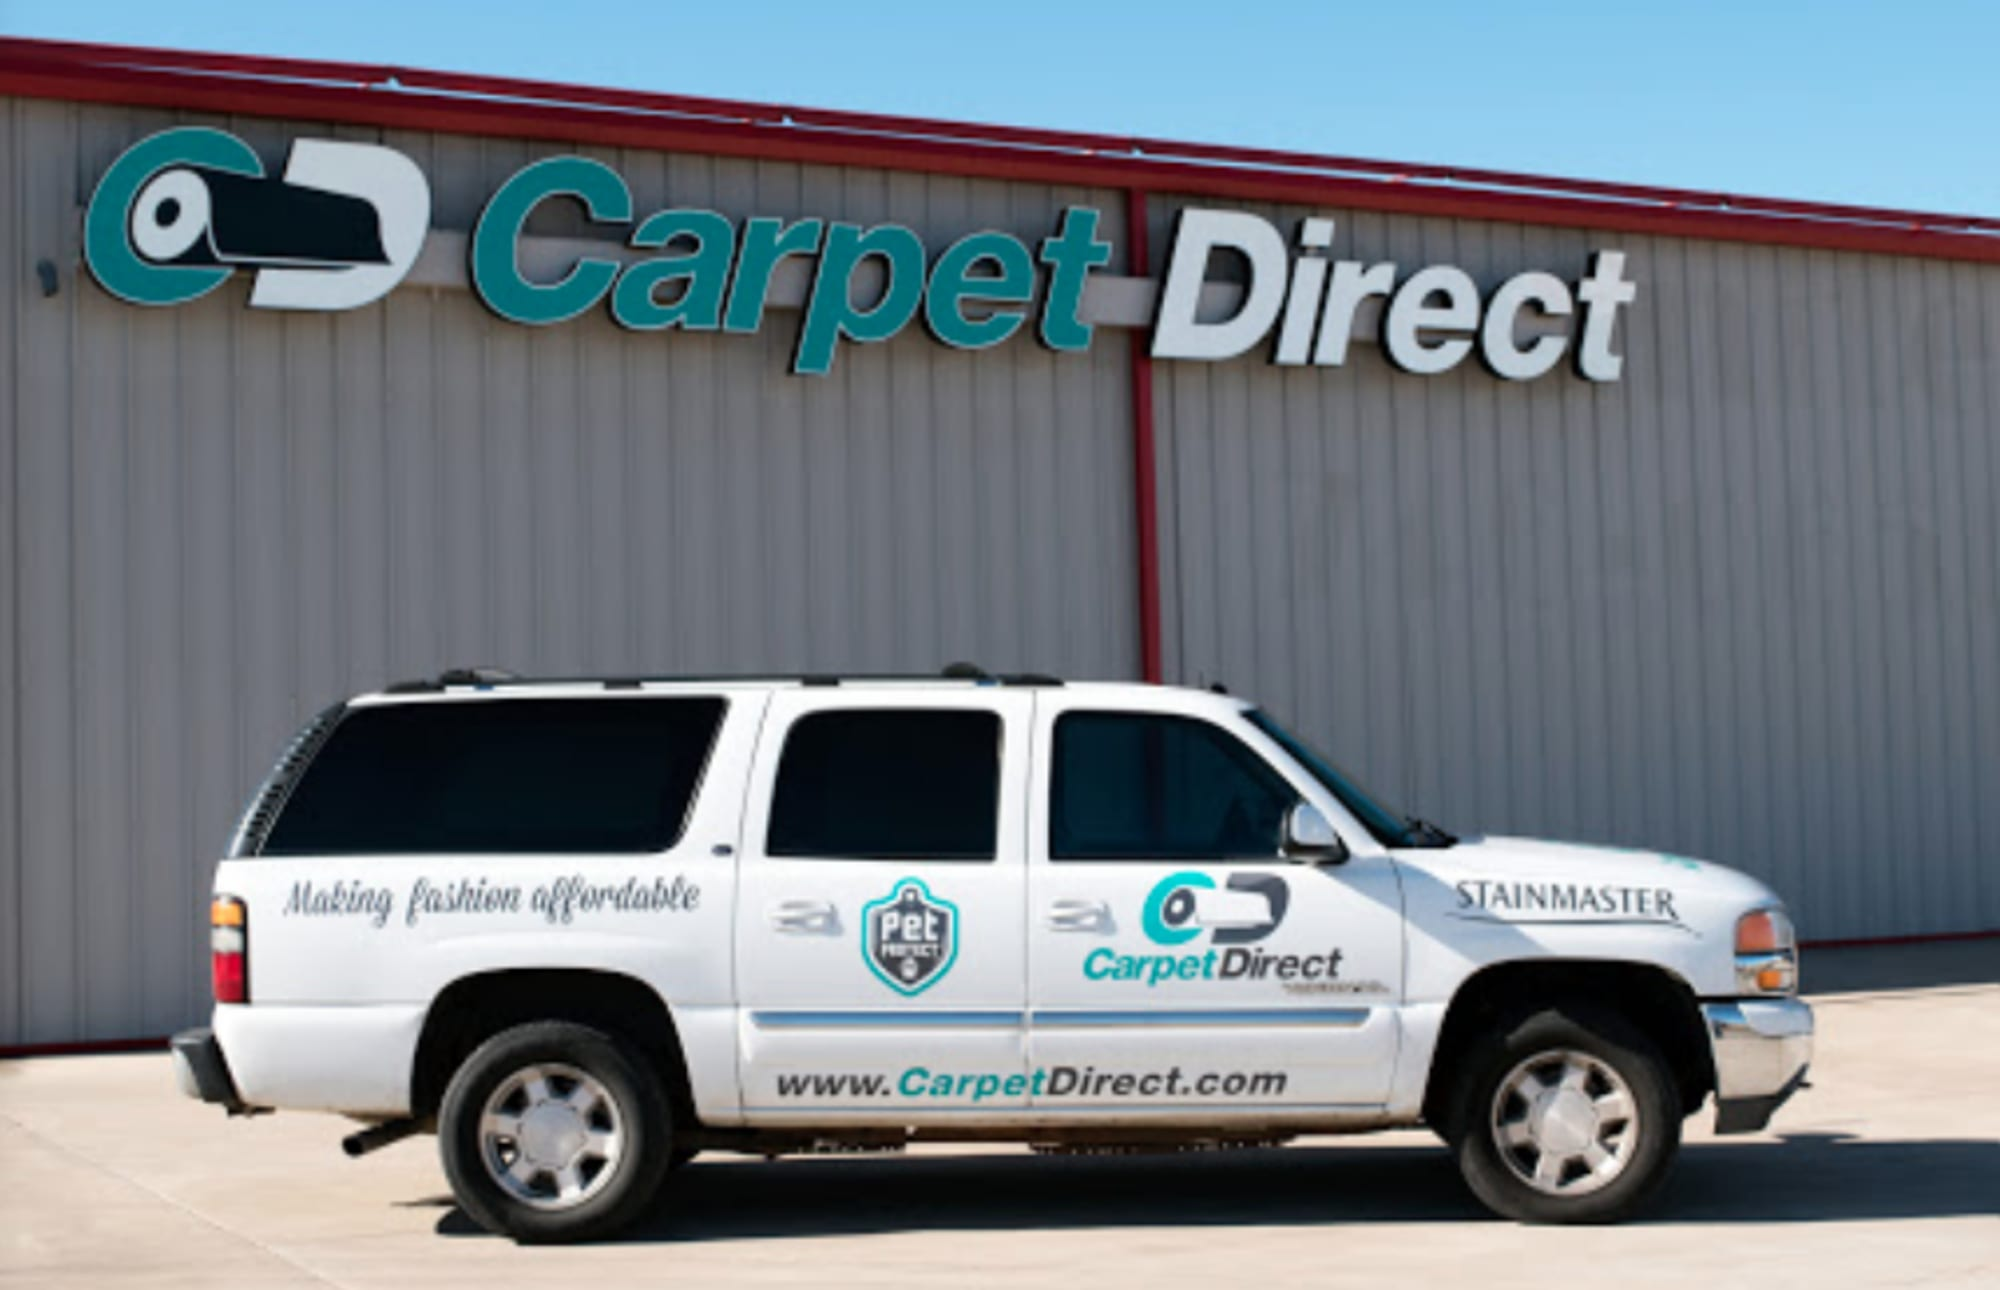 Carpet Direct - 10325 E 49th St Tulsa, OK 74146